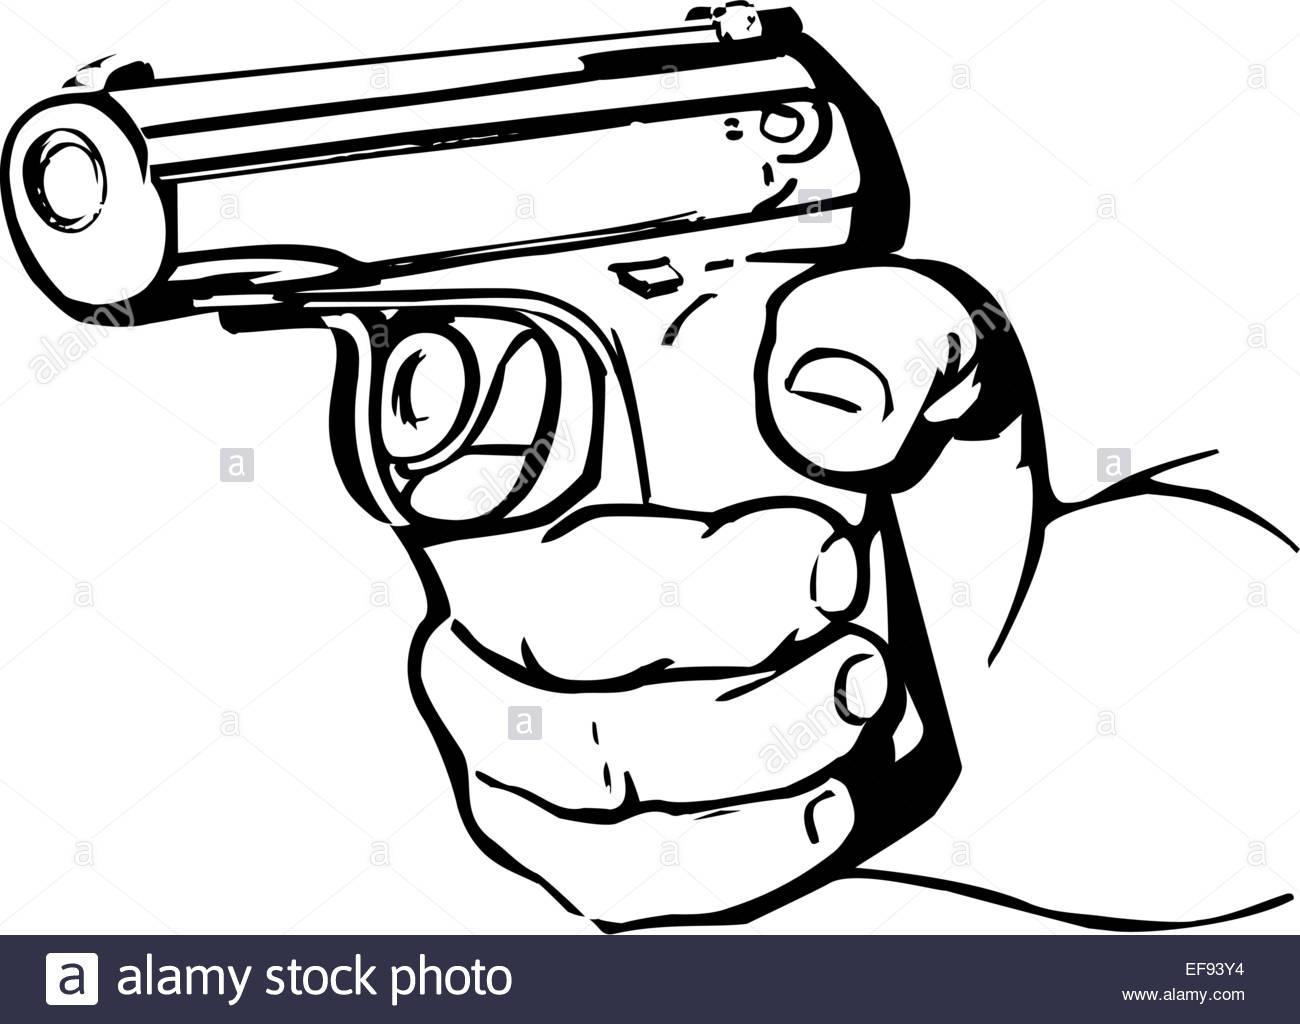 1300x1024 Hand Holding Gun Stock Vector Art Amp Illustration, Vector Image